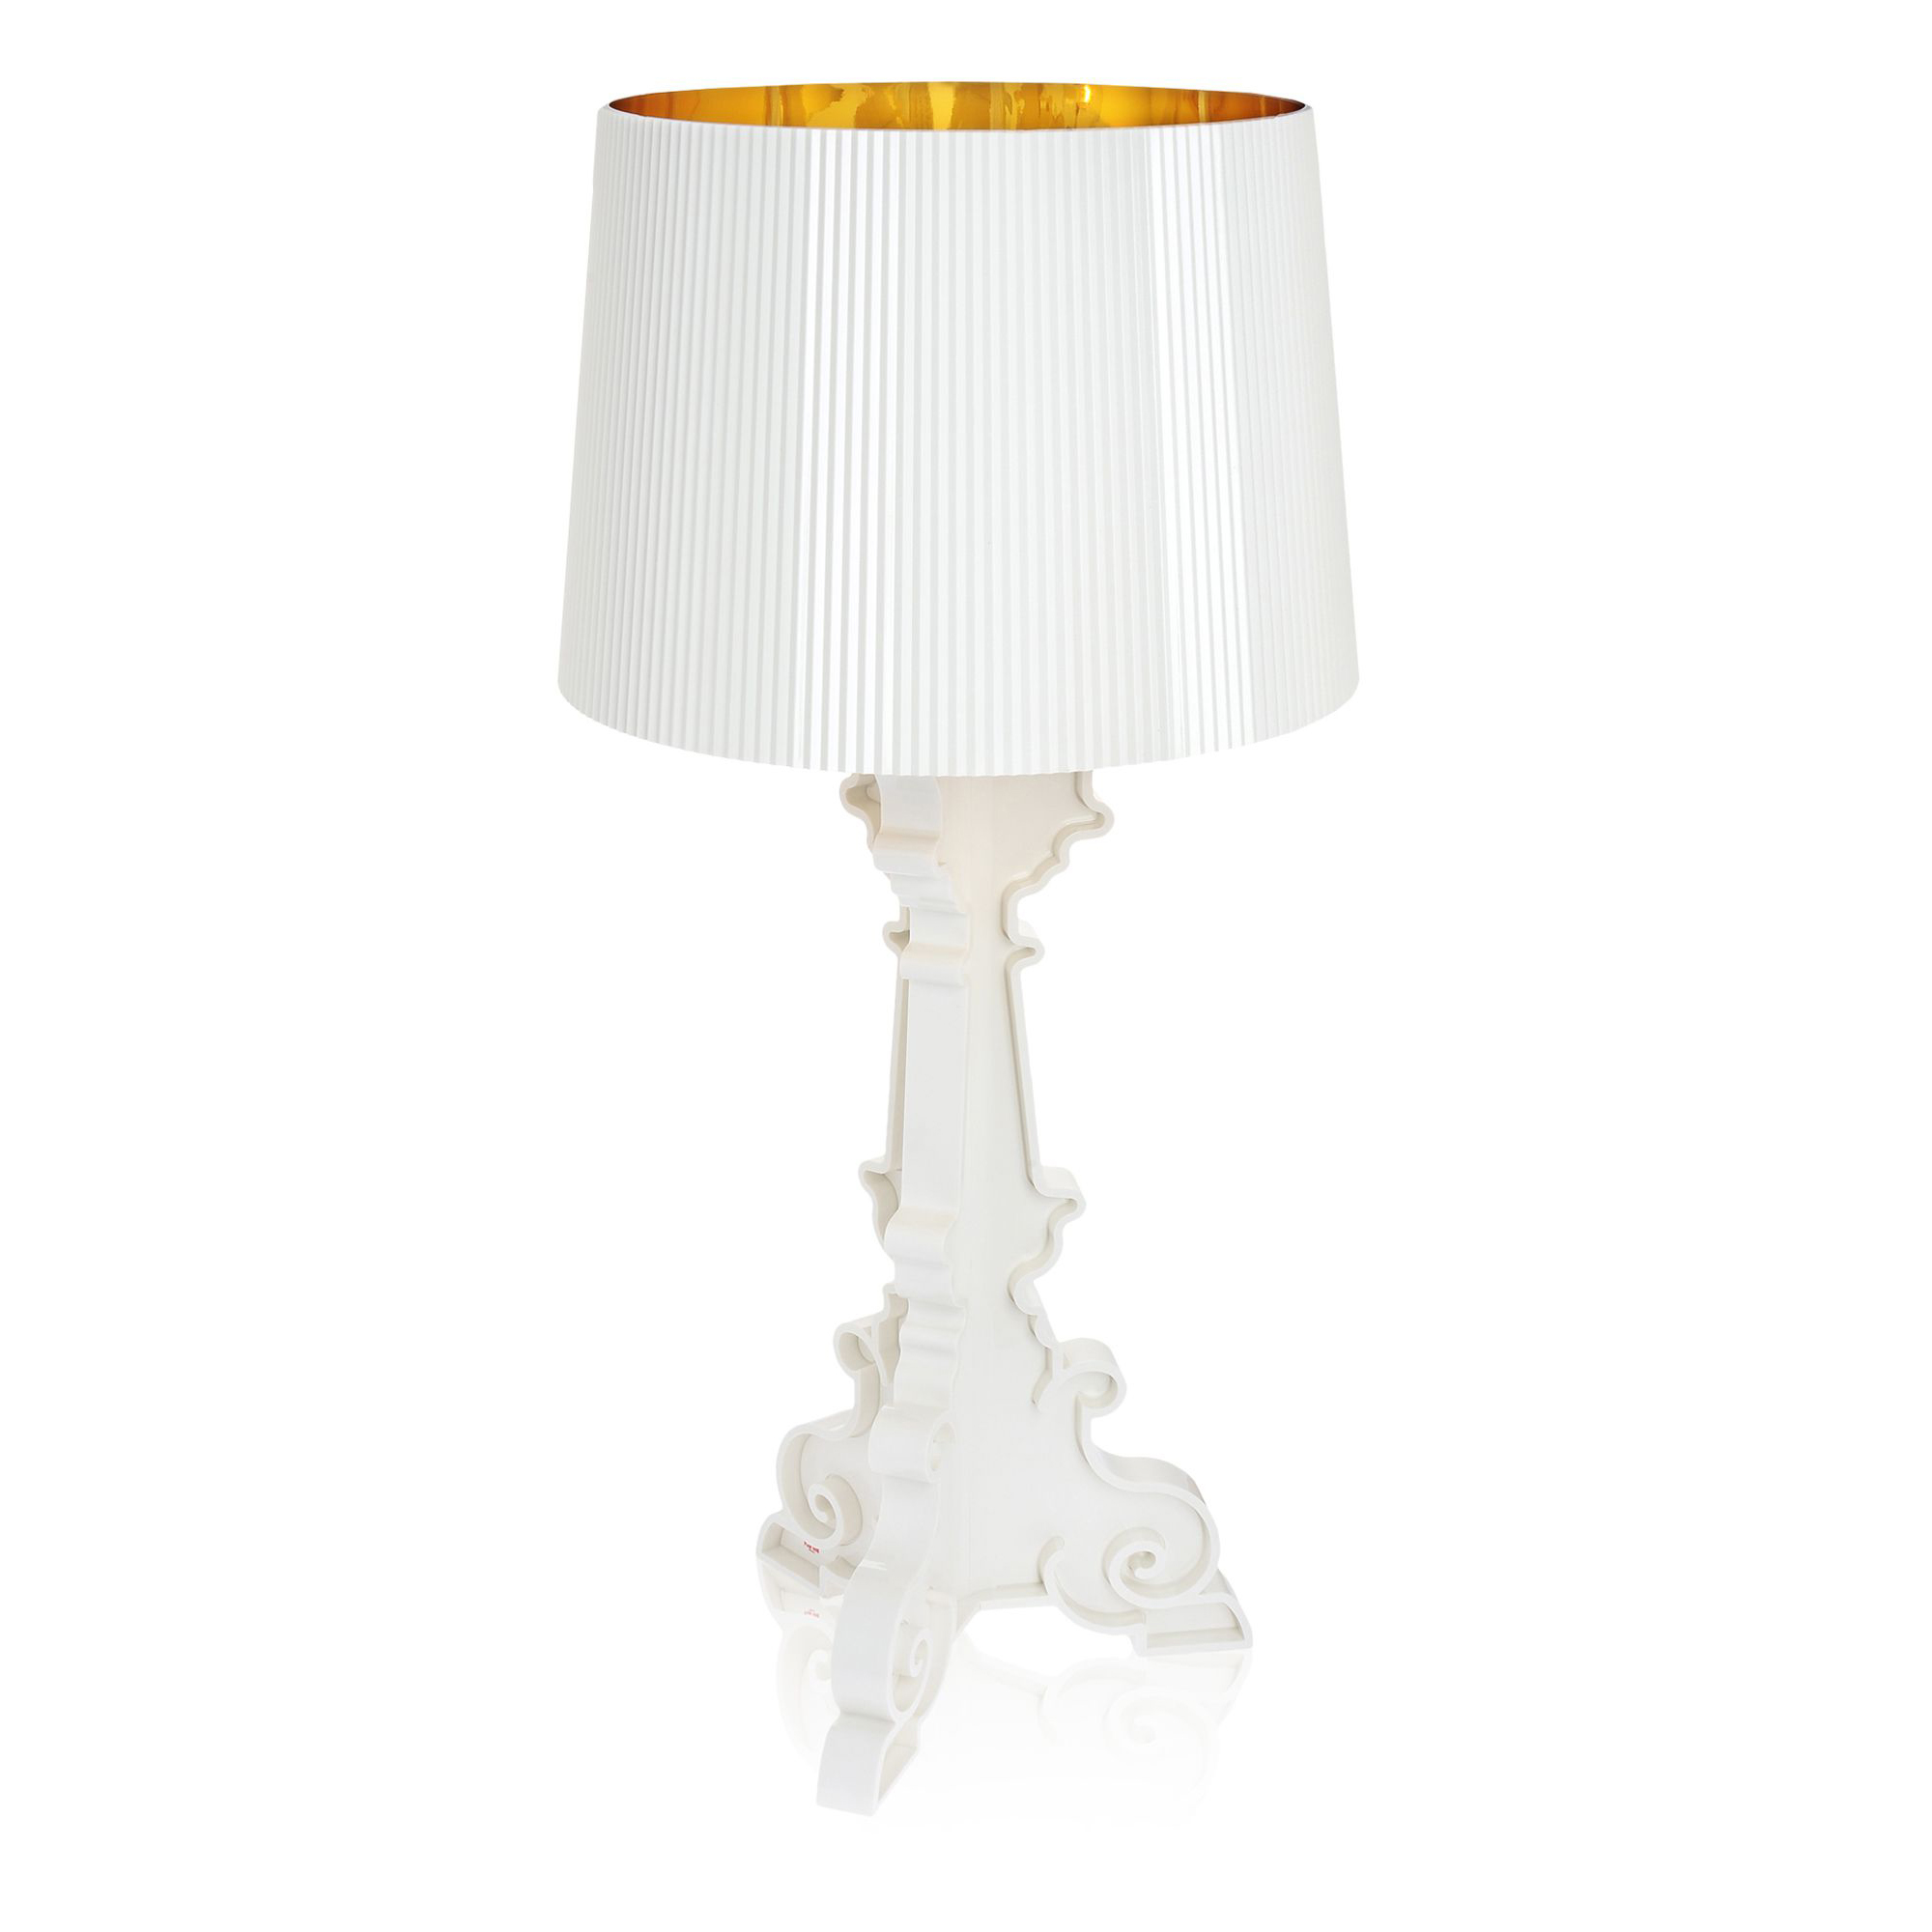 bourgie lamp bourgie lamp ferruccio